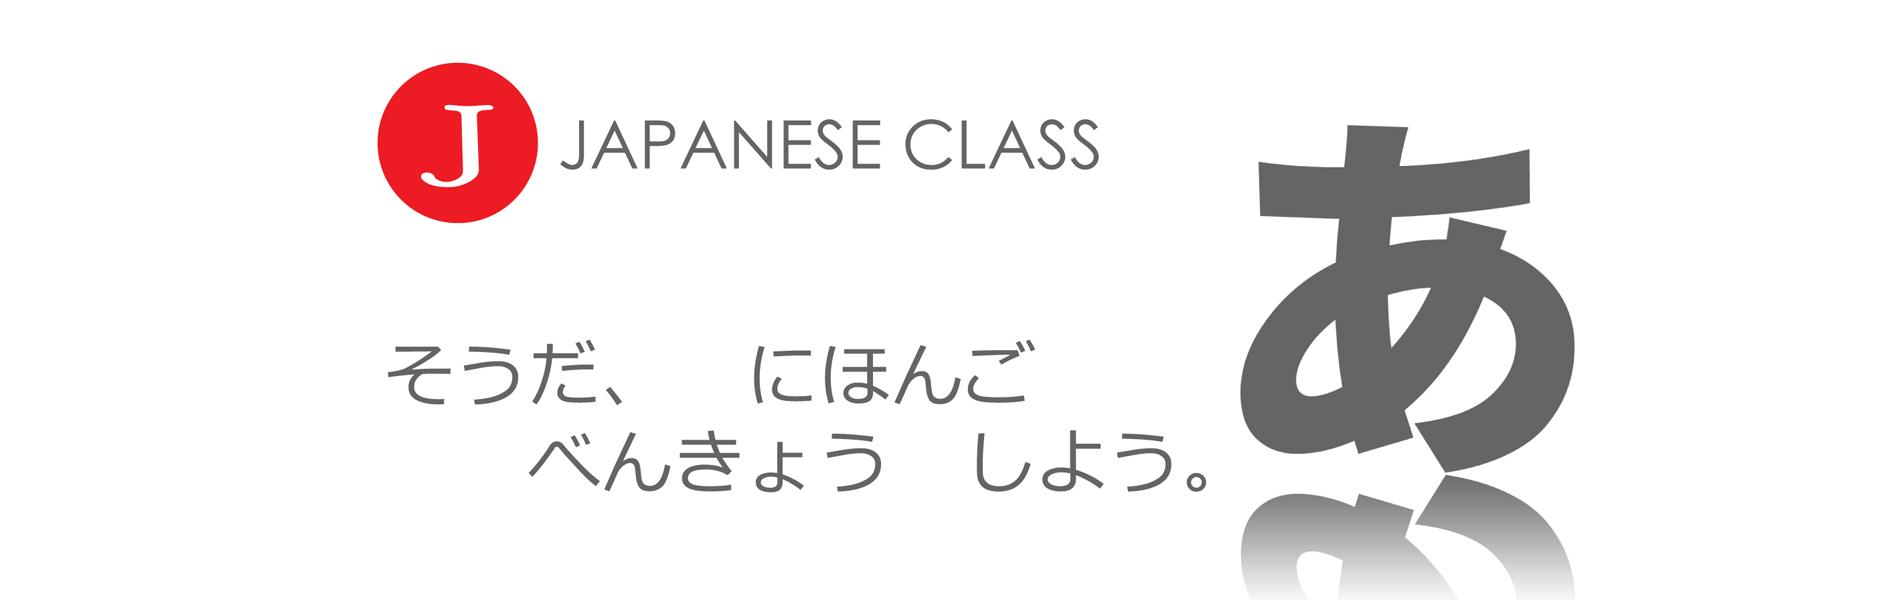 JAPANESE CLASS